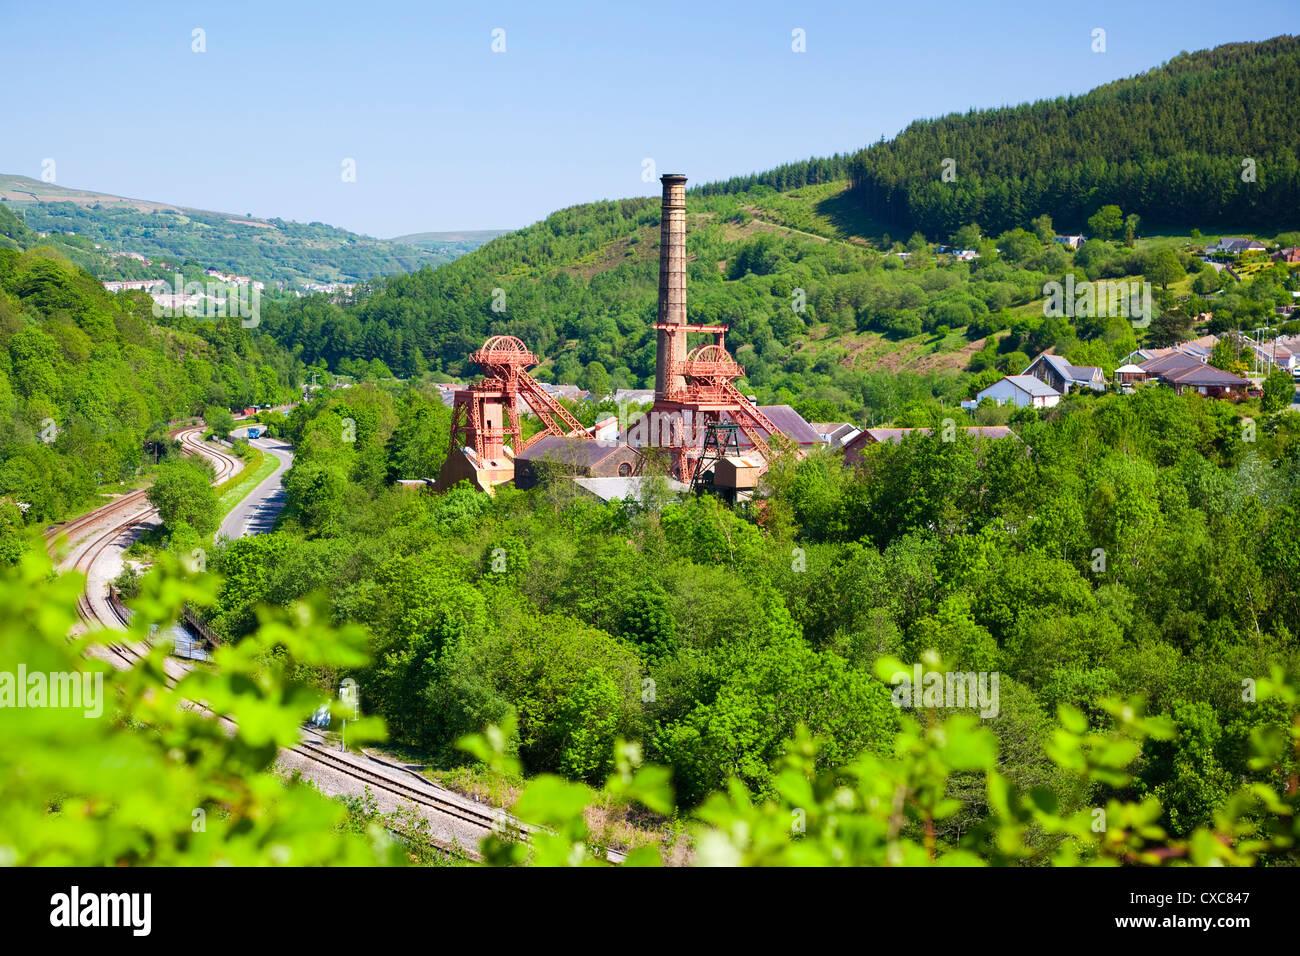 Colliery Pit, Rhondda Heritage Park, Rhondda Valley, South Wales, United Kingdom, Europe - Stock Image